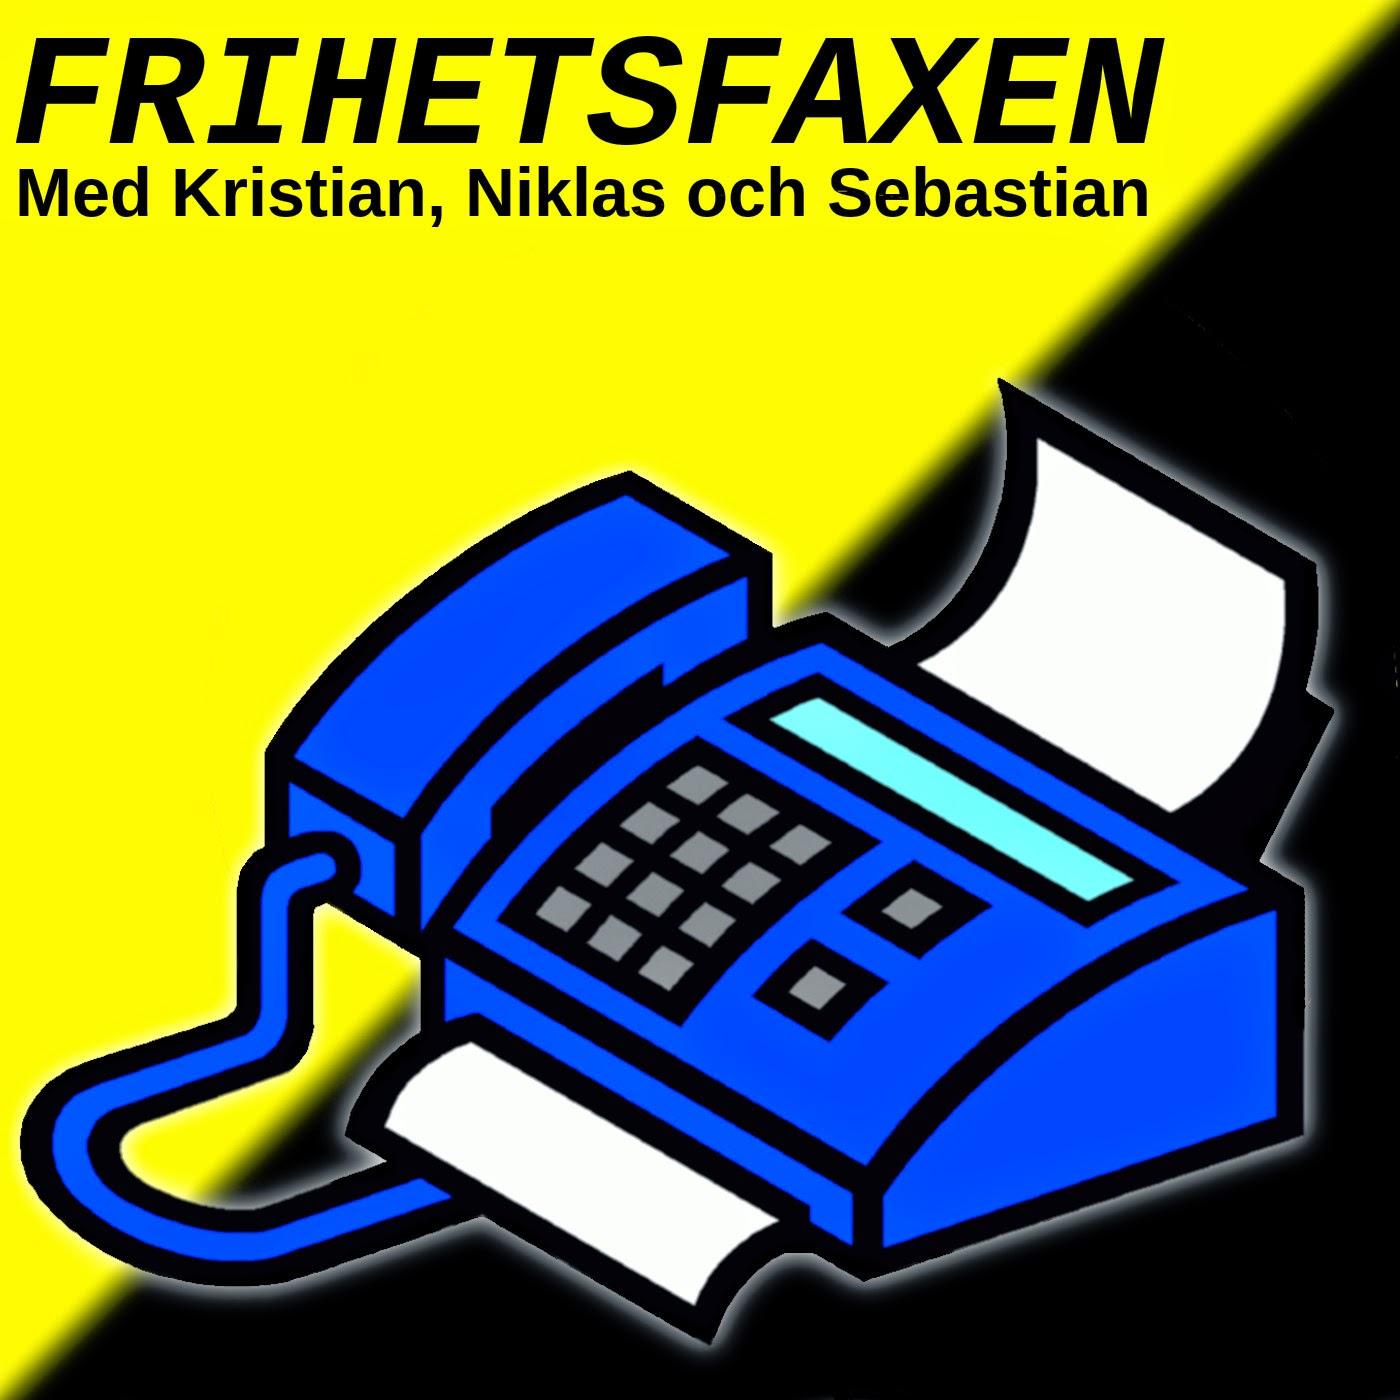 http://frihetsfaxen.se/